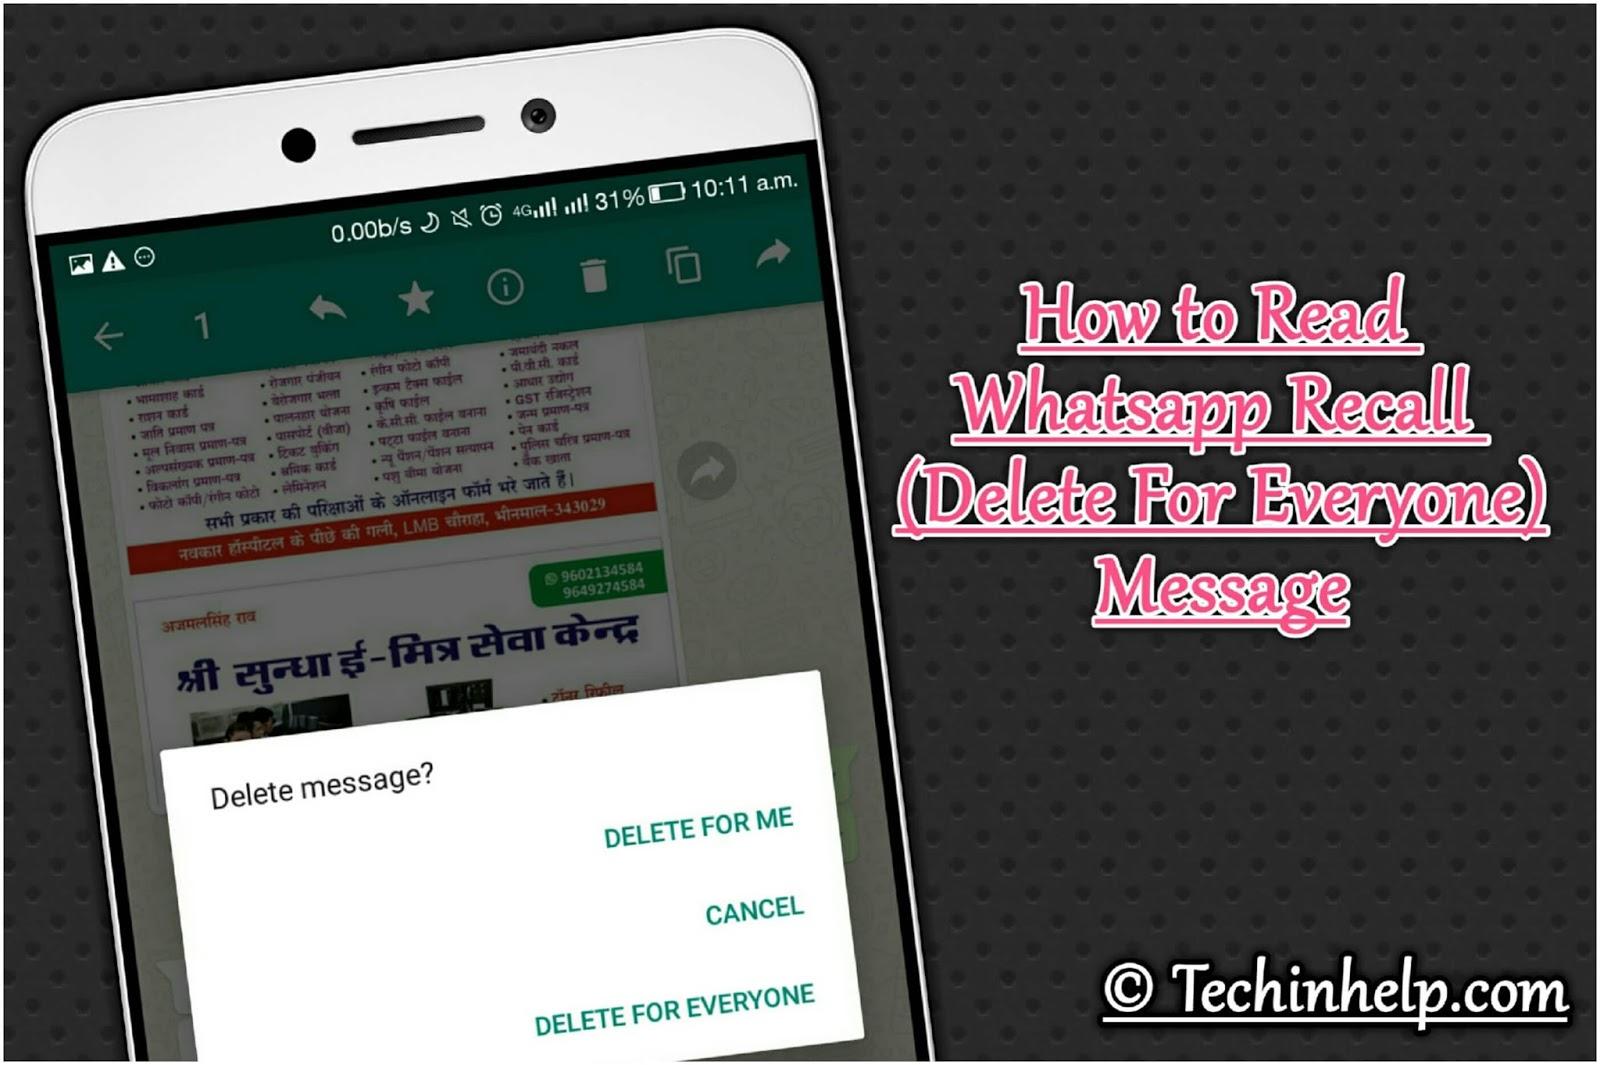 Whatsapp Recall (Delete For Everyone) Message Ko Read Kaise Kare